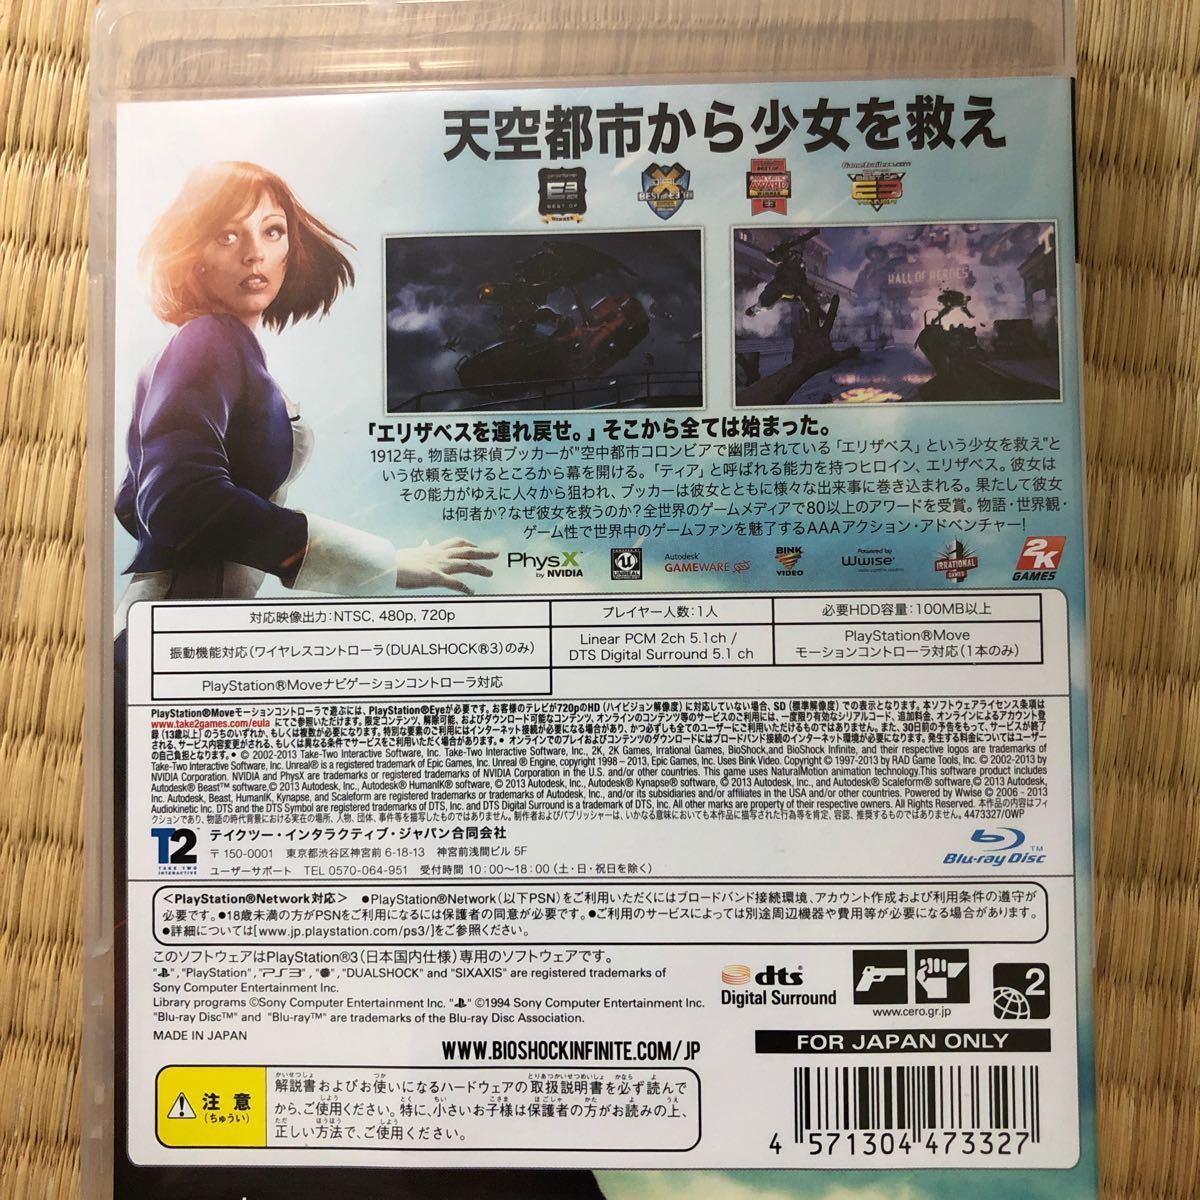 PS3 バイオショックインフィニット☆名作ゲーム地味ハマ♪(°▽°)